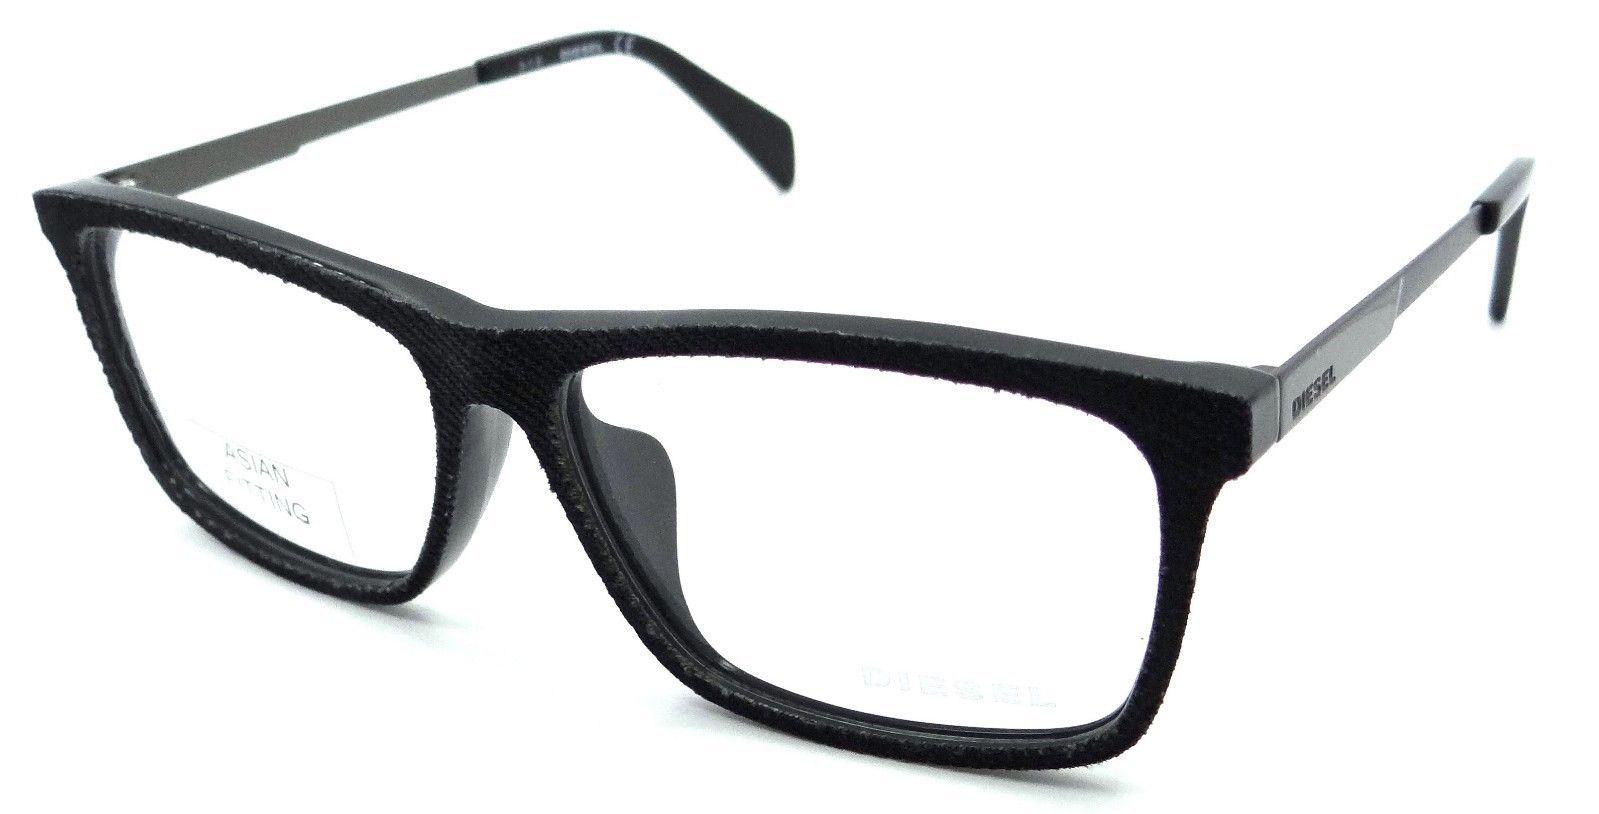 b3e48024b65e Diesel Rx Eyeglasses Frames DL5153-F 001 and 50 similar items. 57